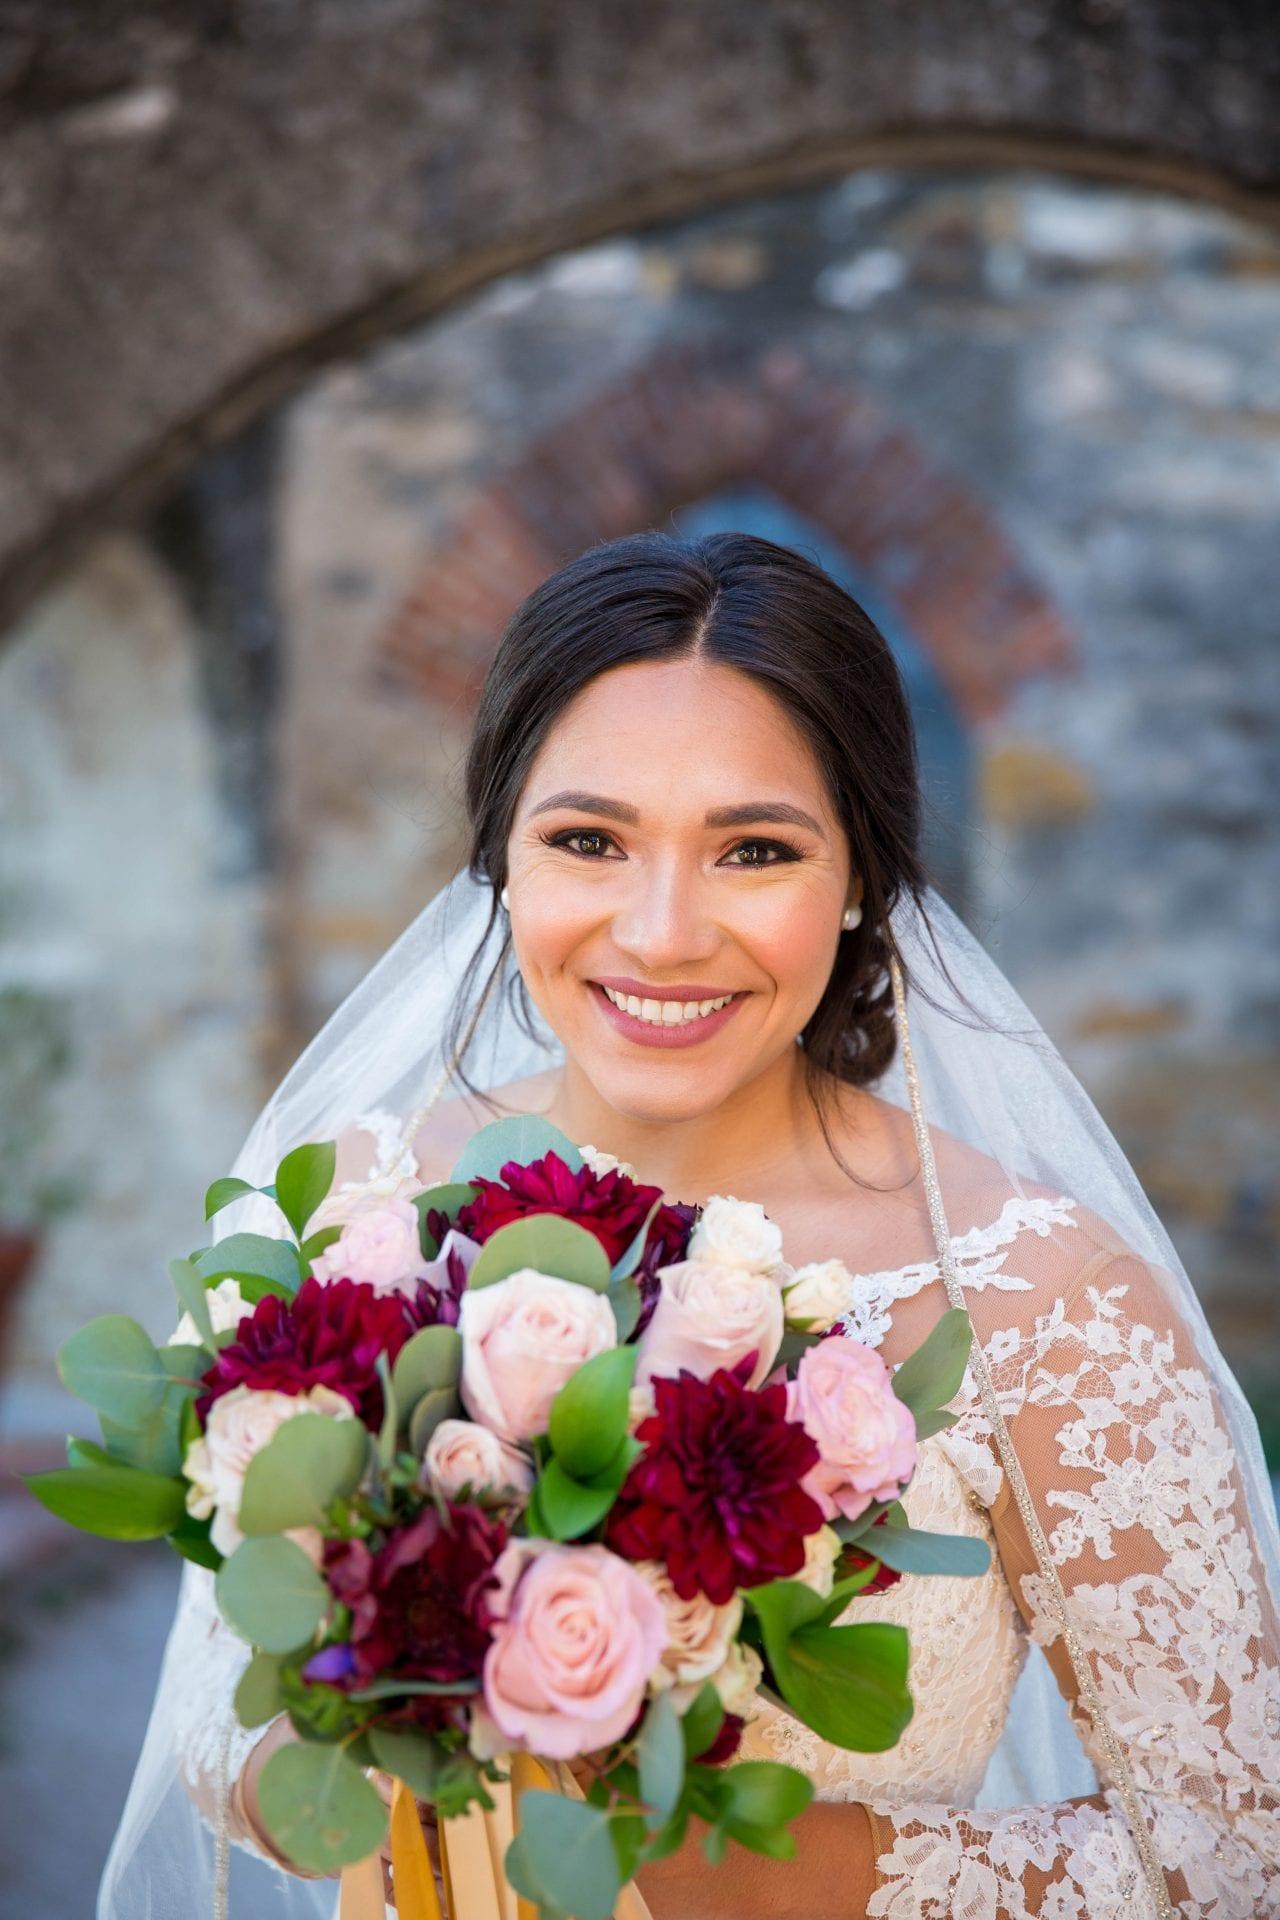 Kristen H Bridal holding flowers Mission San Jose